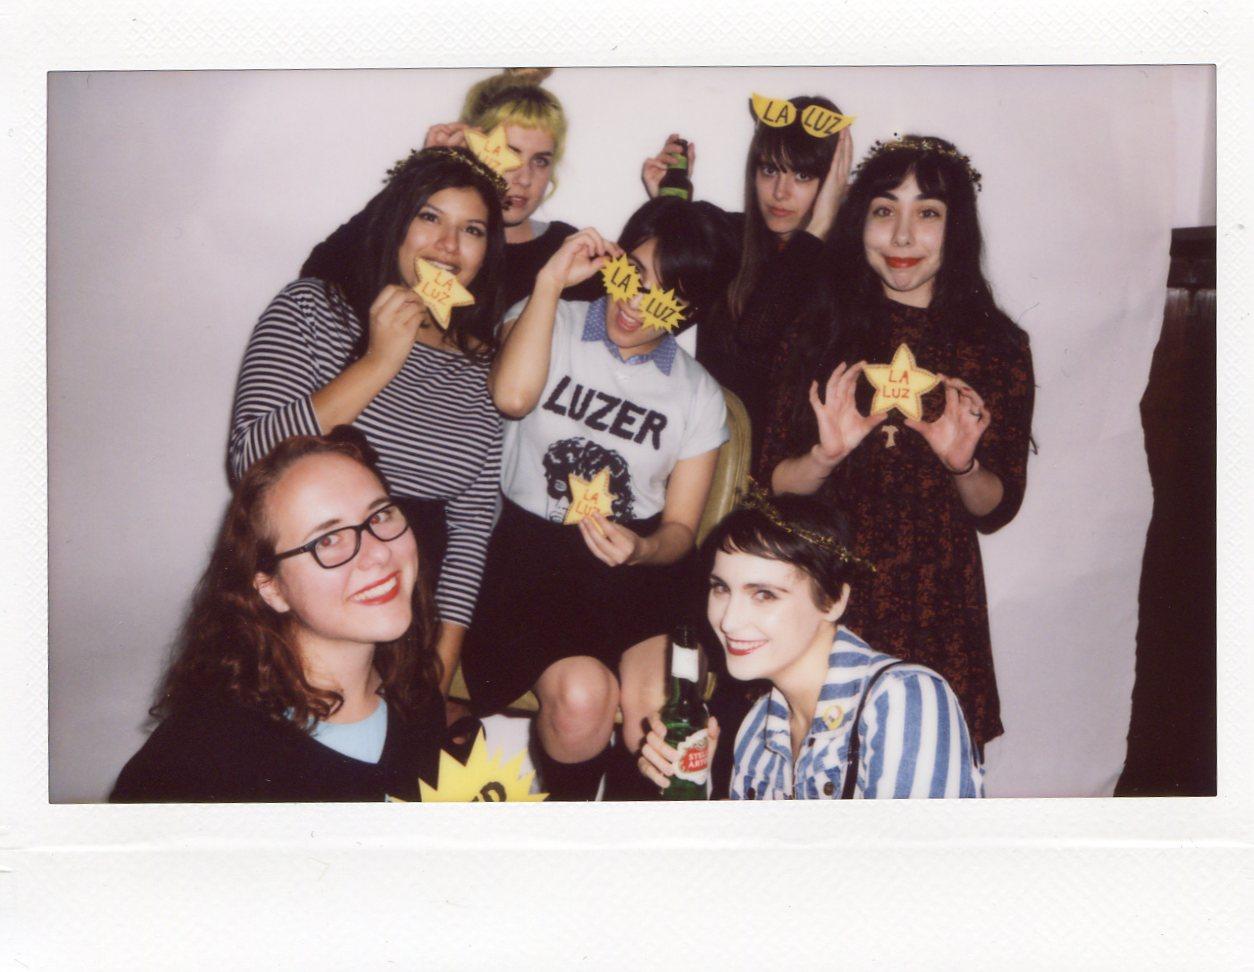 Angela, Mukta, Hannah, Chelsea, Justine, Gabrielle, and Monique